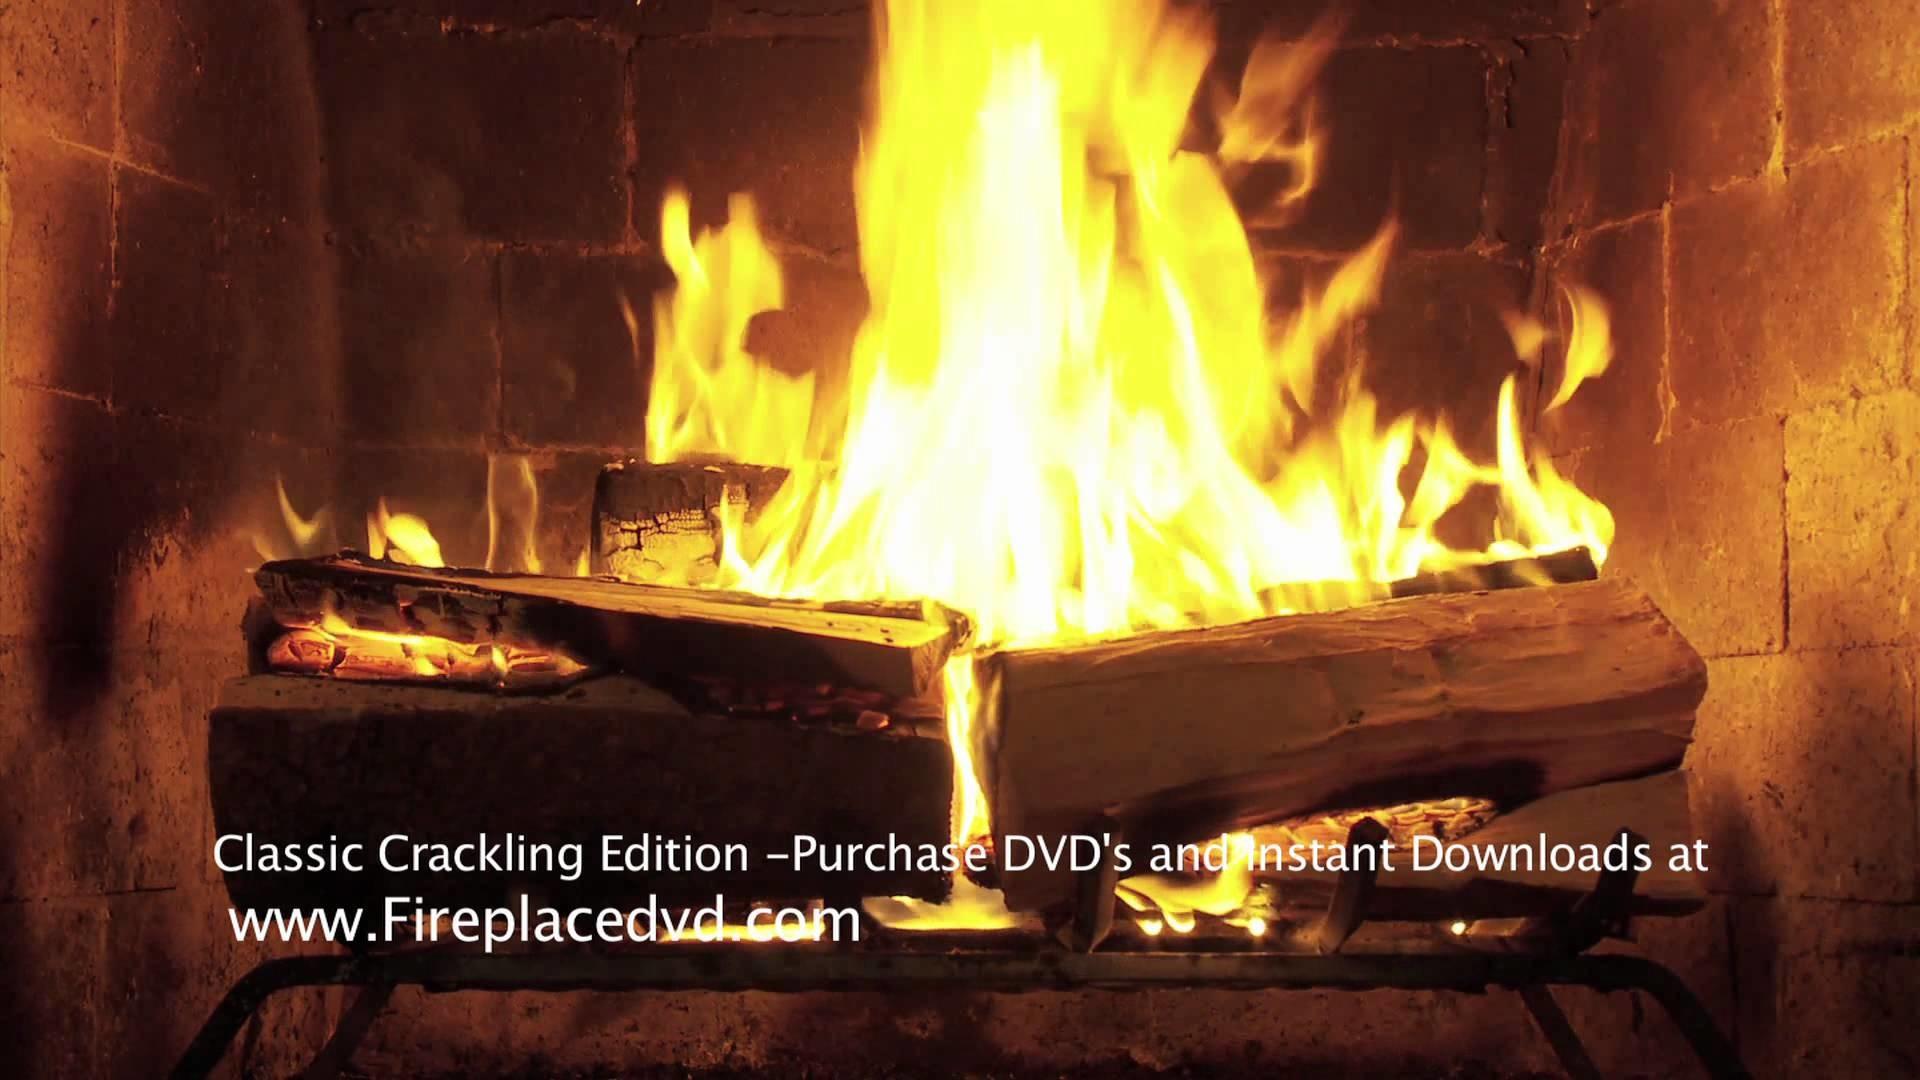 Animated Desktop Wallpaper For Windows 7 Free Download Animated Fire Desktop Wallpaper 51 Images